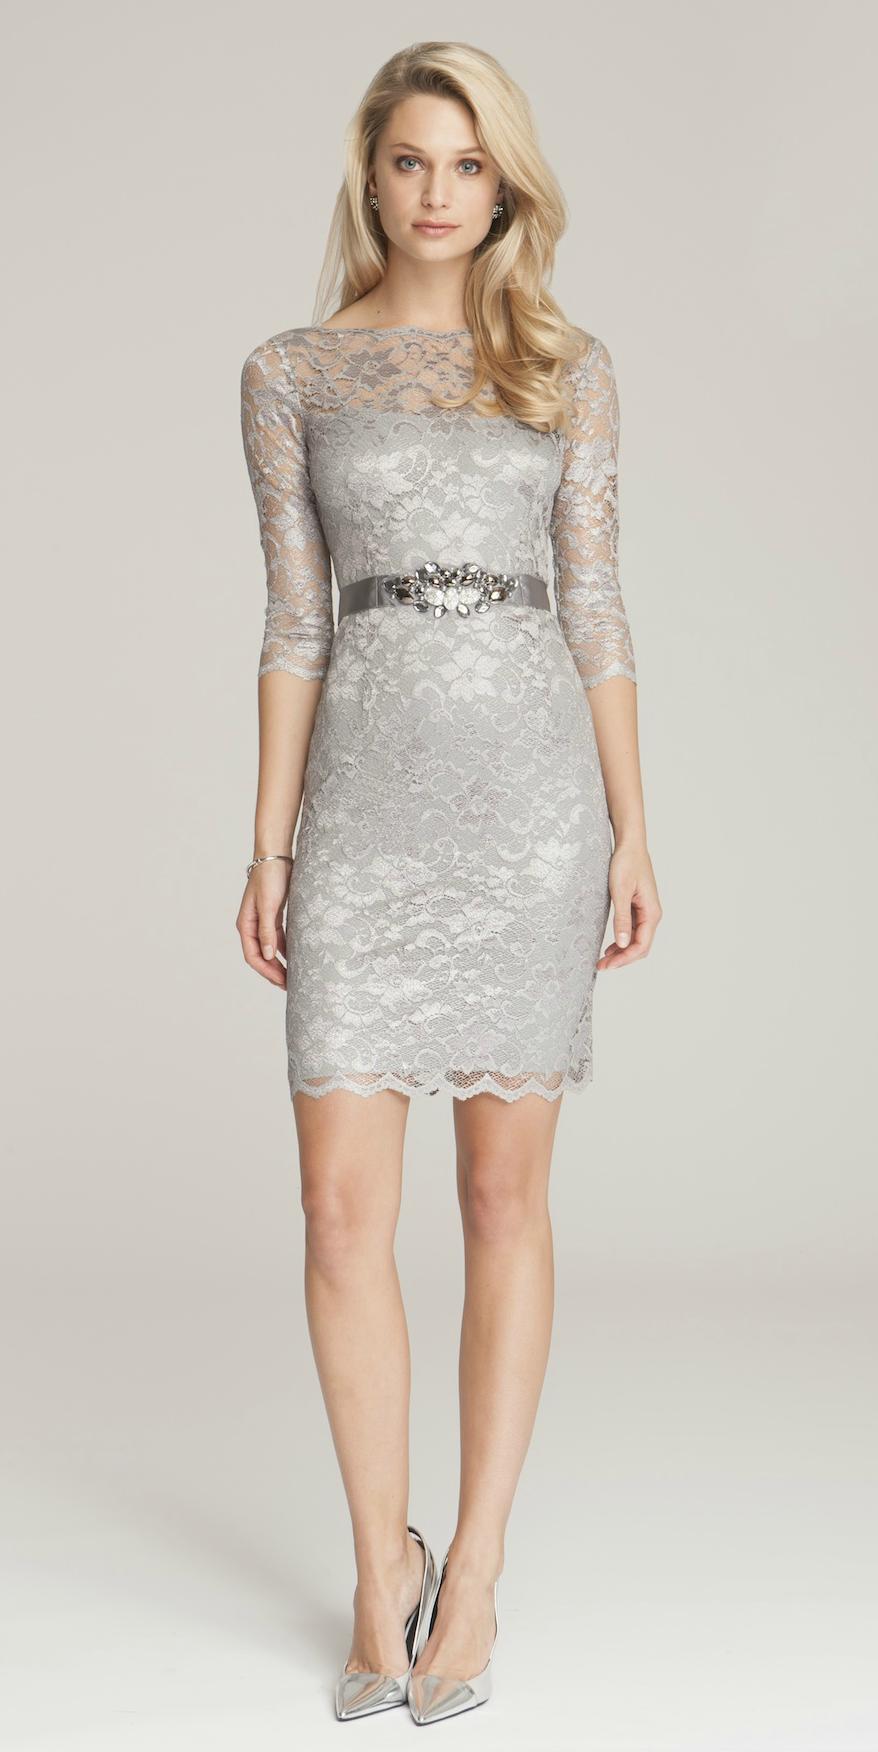 Silver dresses cocktail dresses